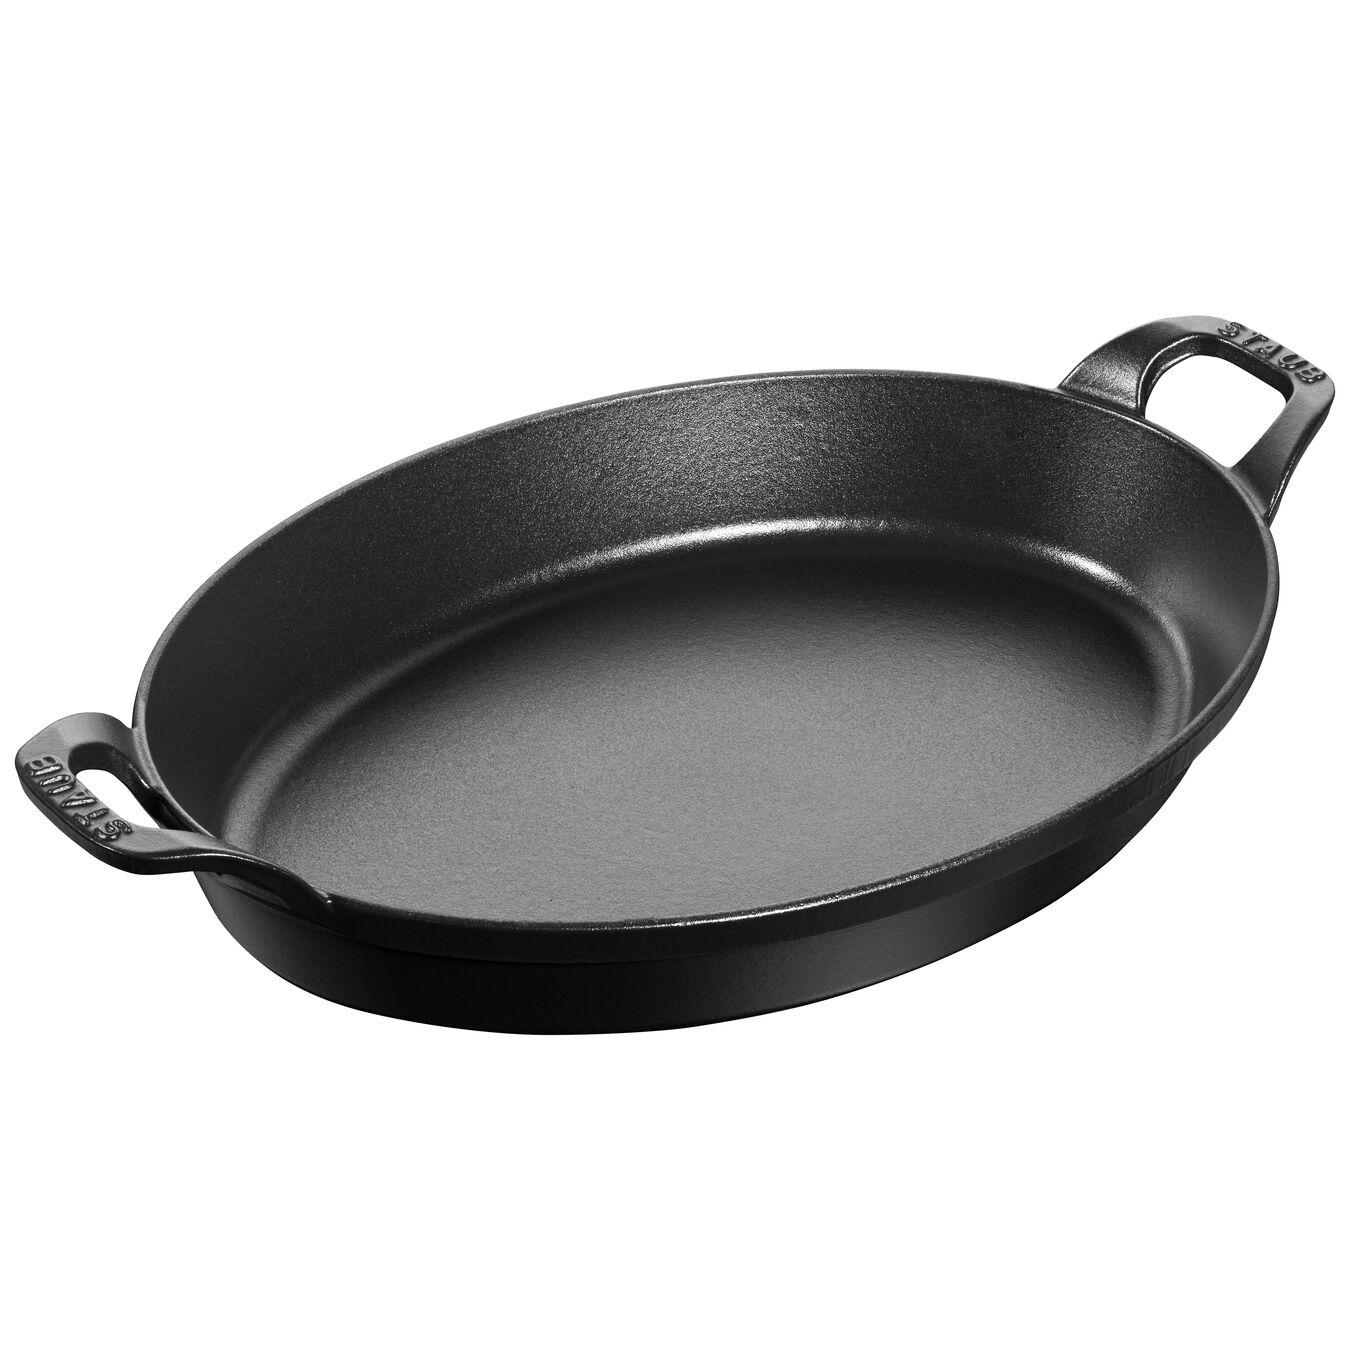 Cast iron oval Oven dish, Black,,large 1